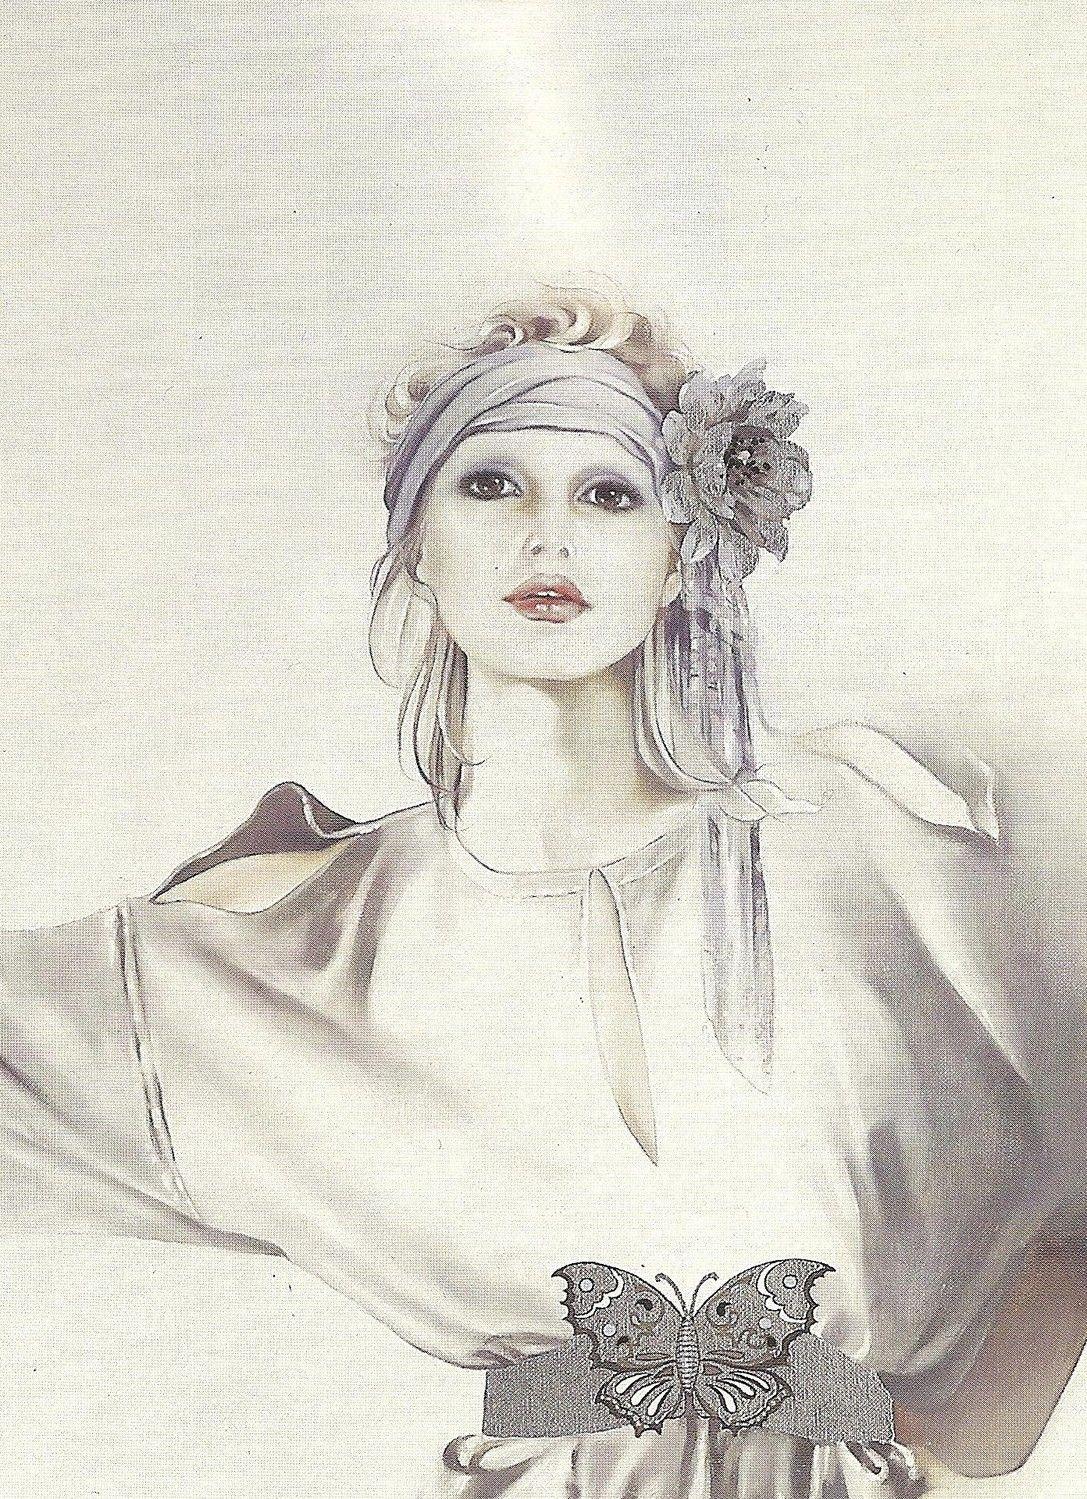 by Bijan Djamalzadeh (Sara Moon ~ artist)